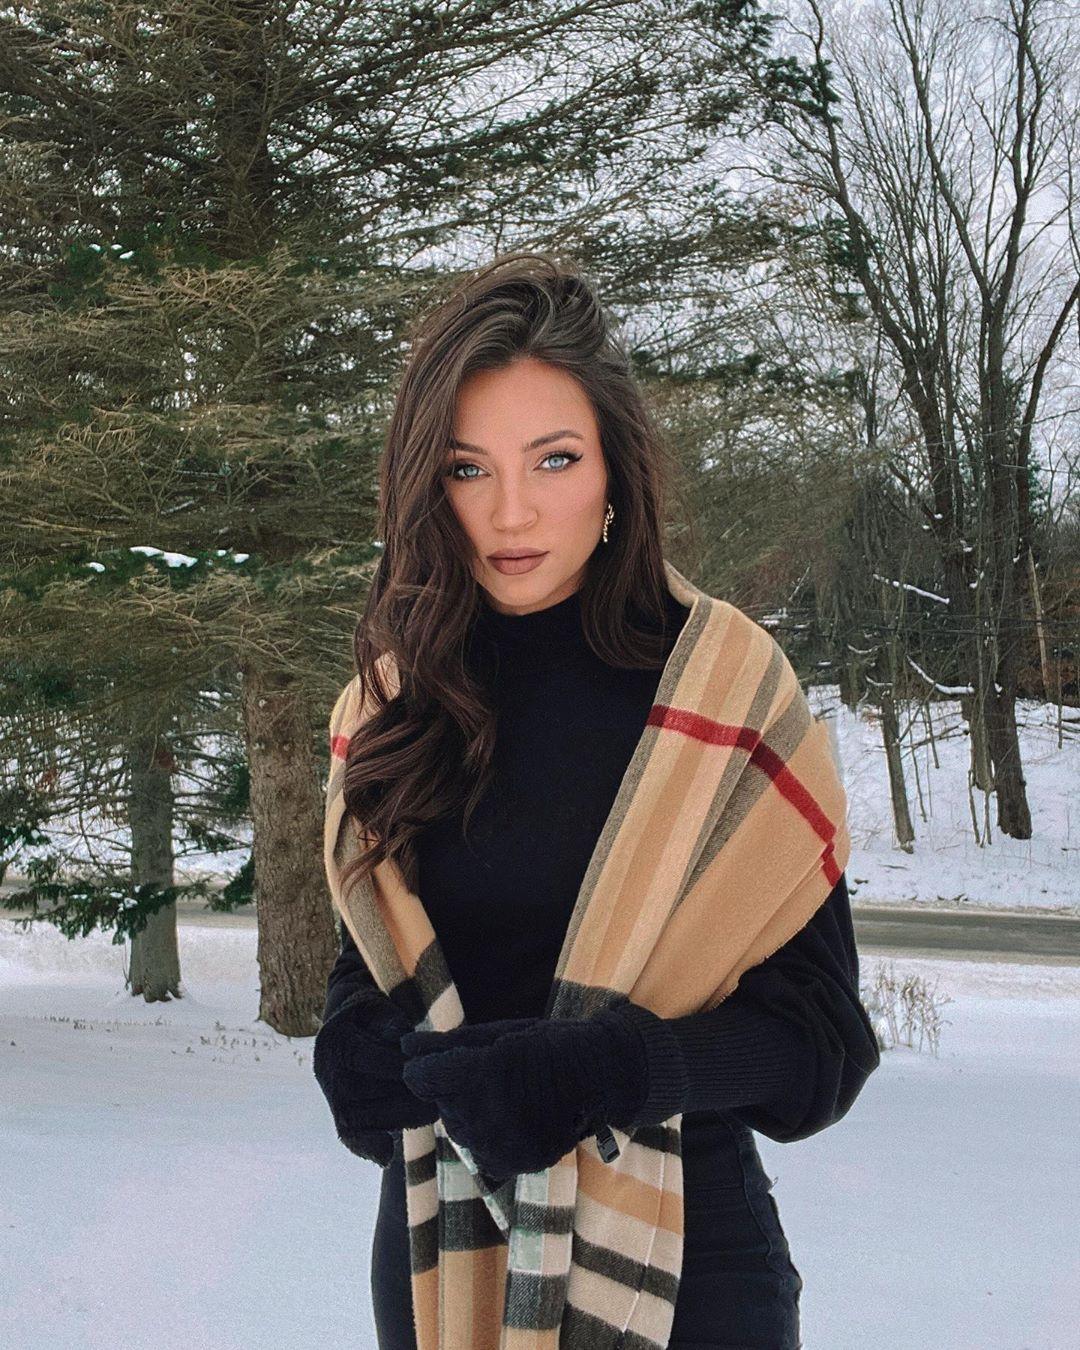 Stephanie Ledda on Instagram: New hair. New Video. 💇🏻🎥 It